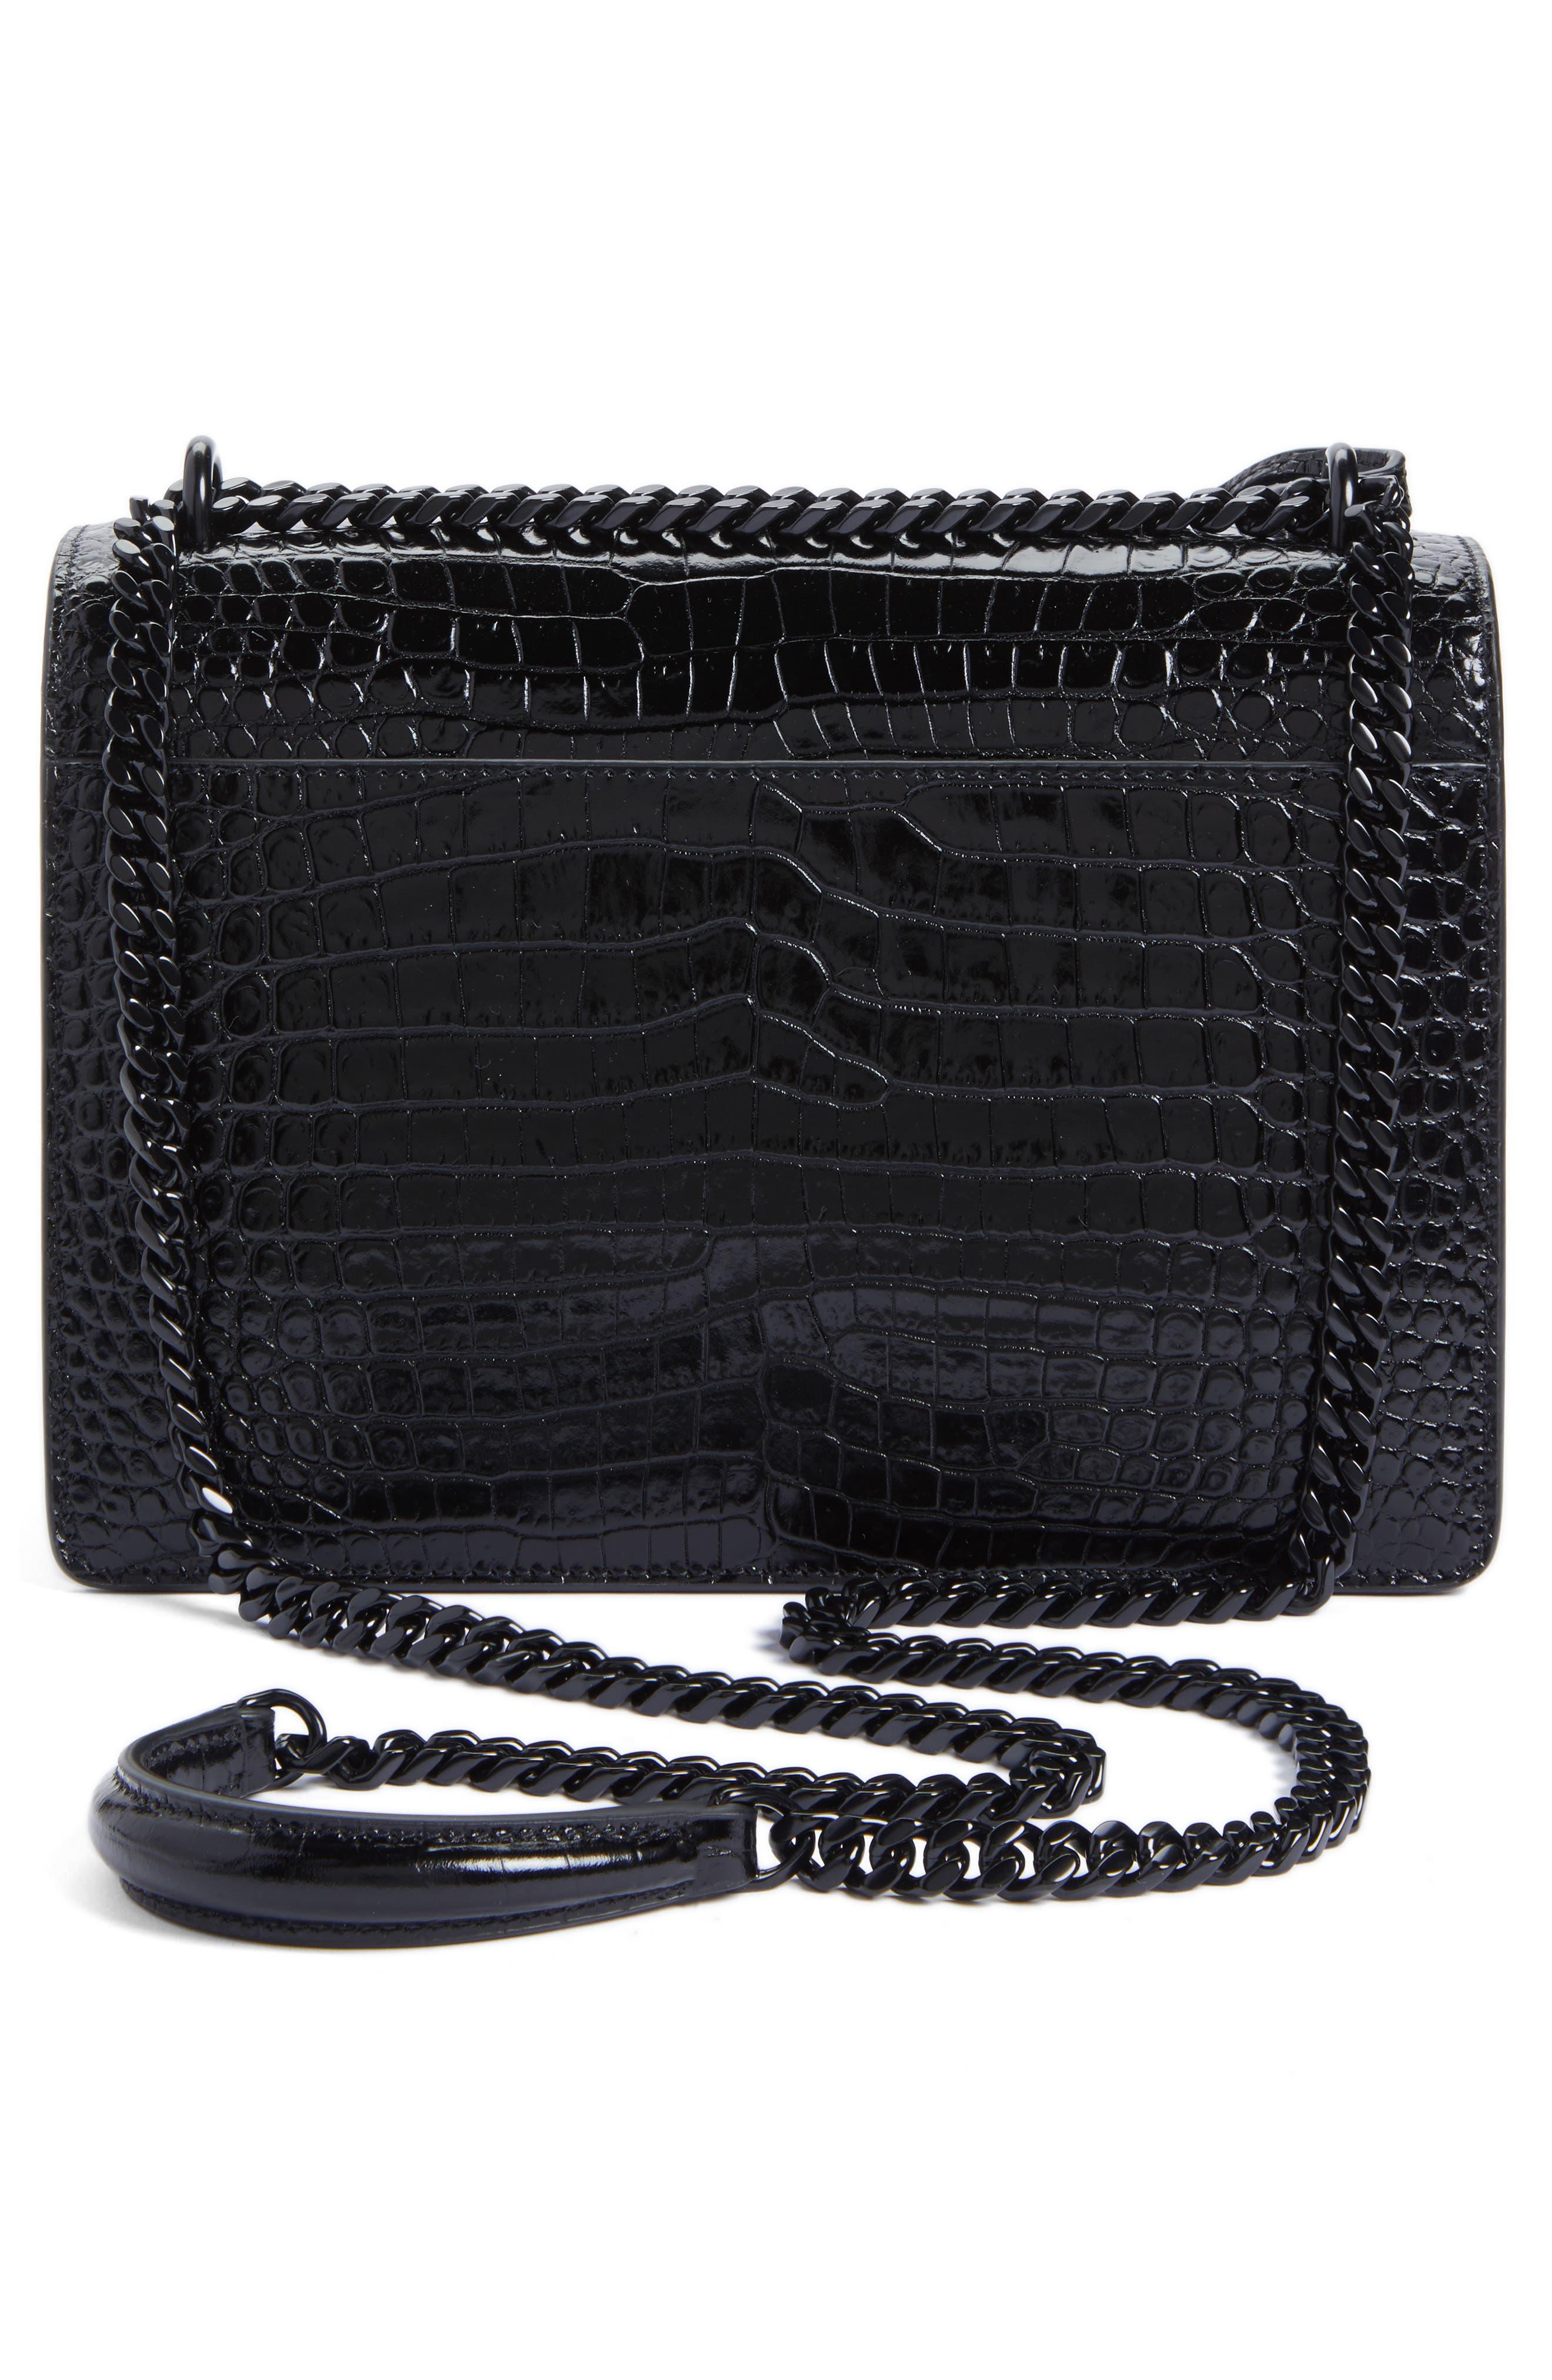 Alternate Image 3  - Saint Laurent Medium Sunset Croc Embossed Leather Shoulder Bag